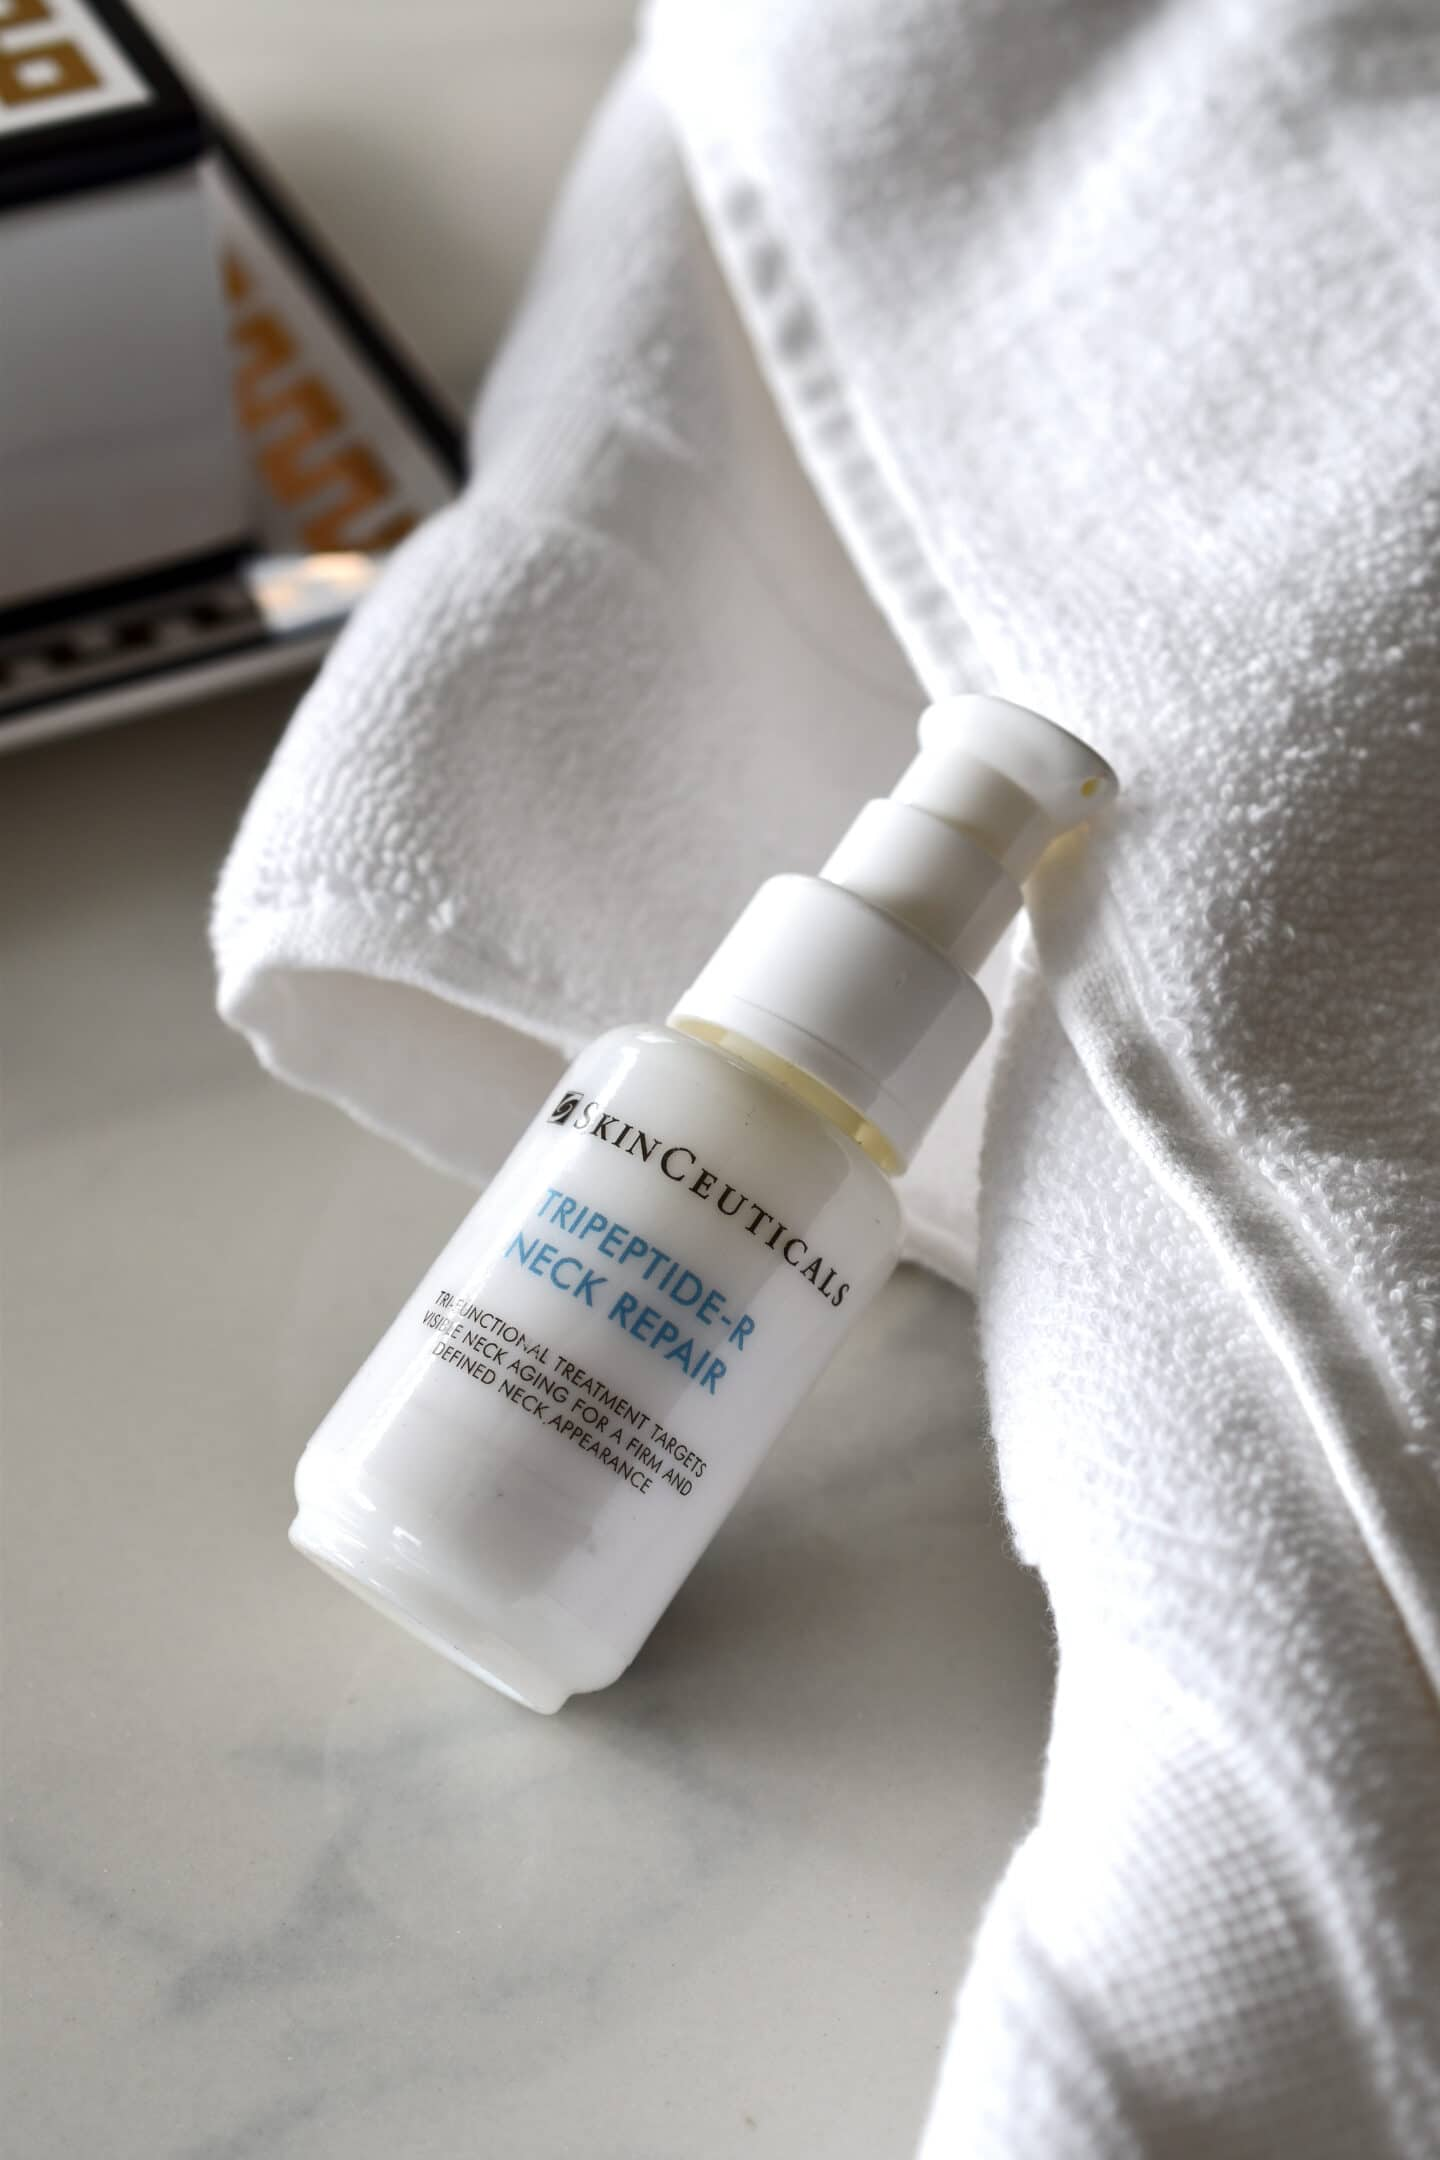 Skinceuticals Tripeptide-R Neck Repair Erfahrung